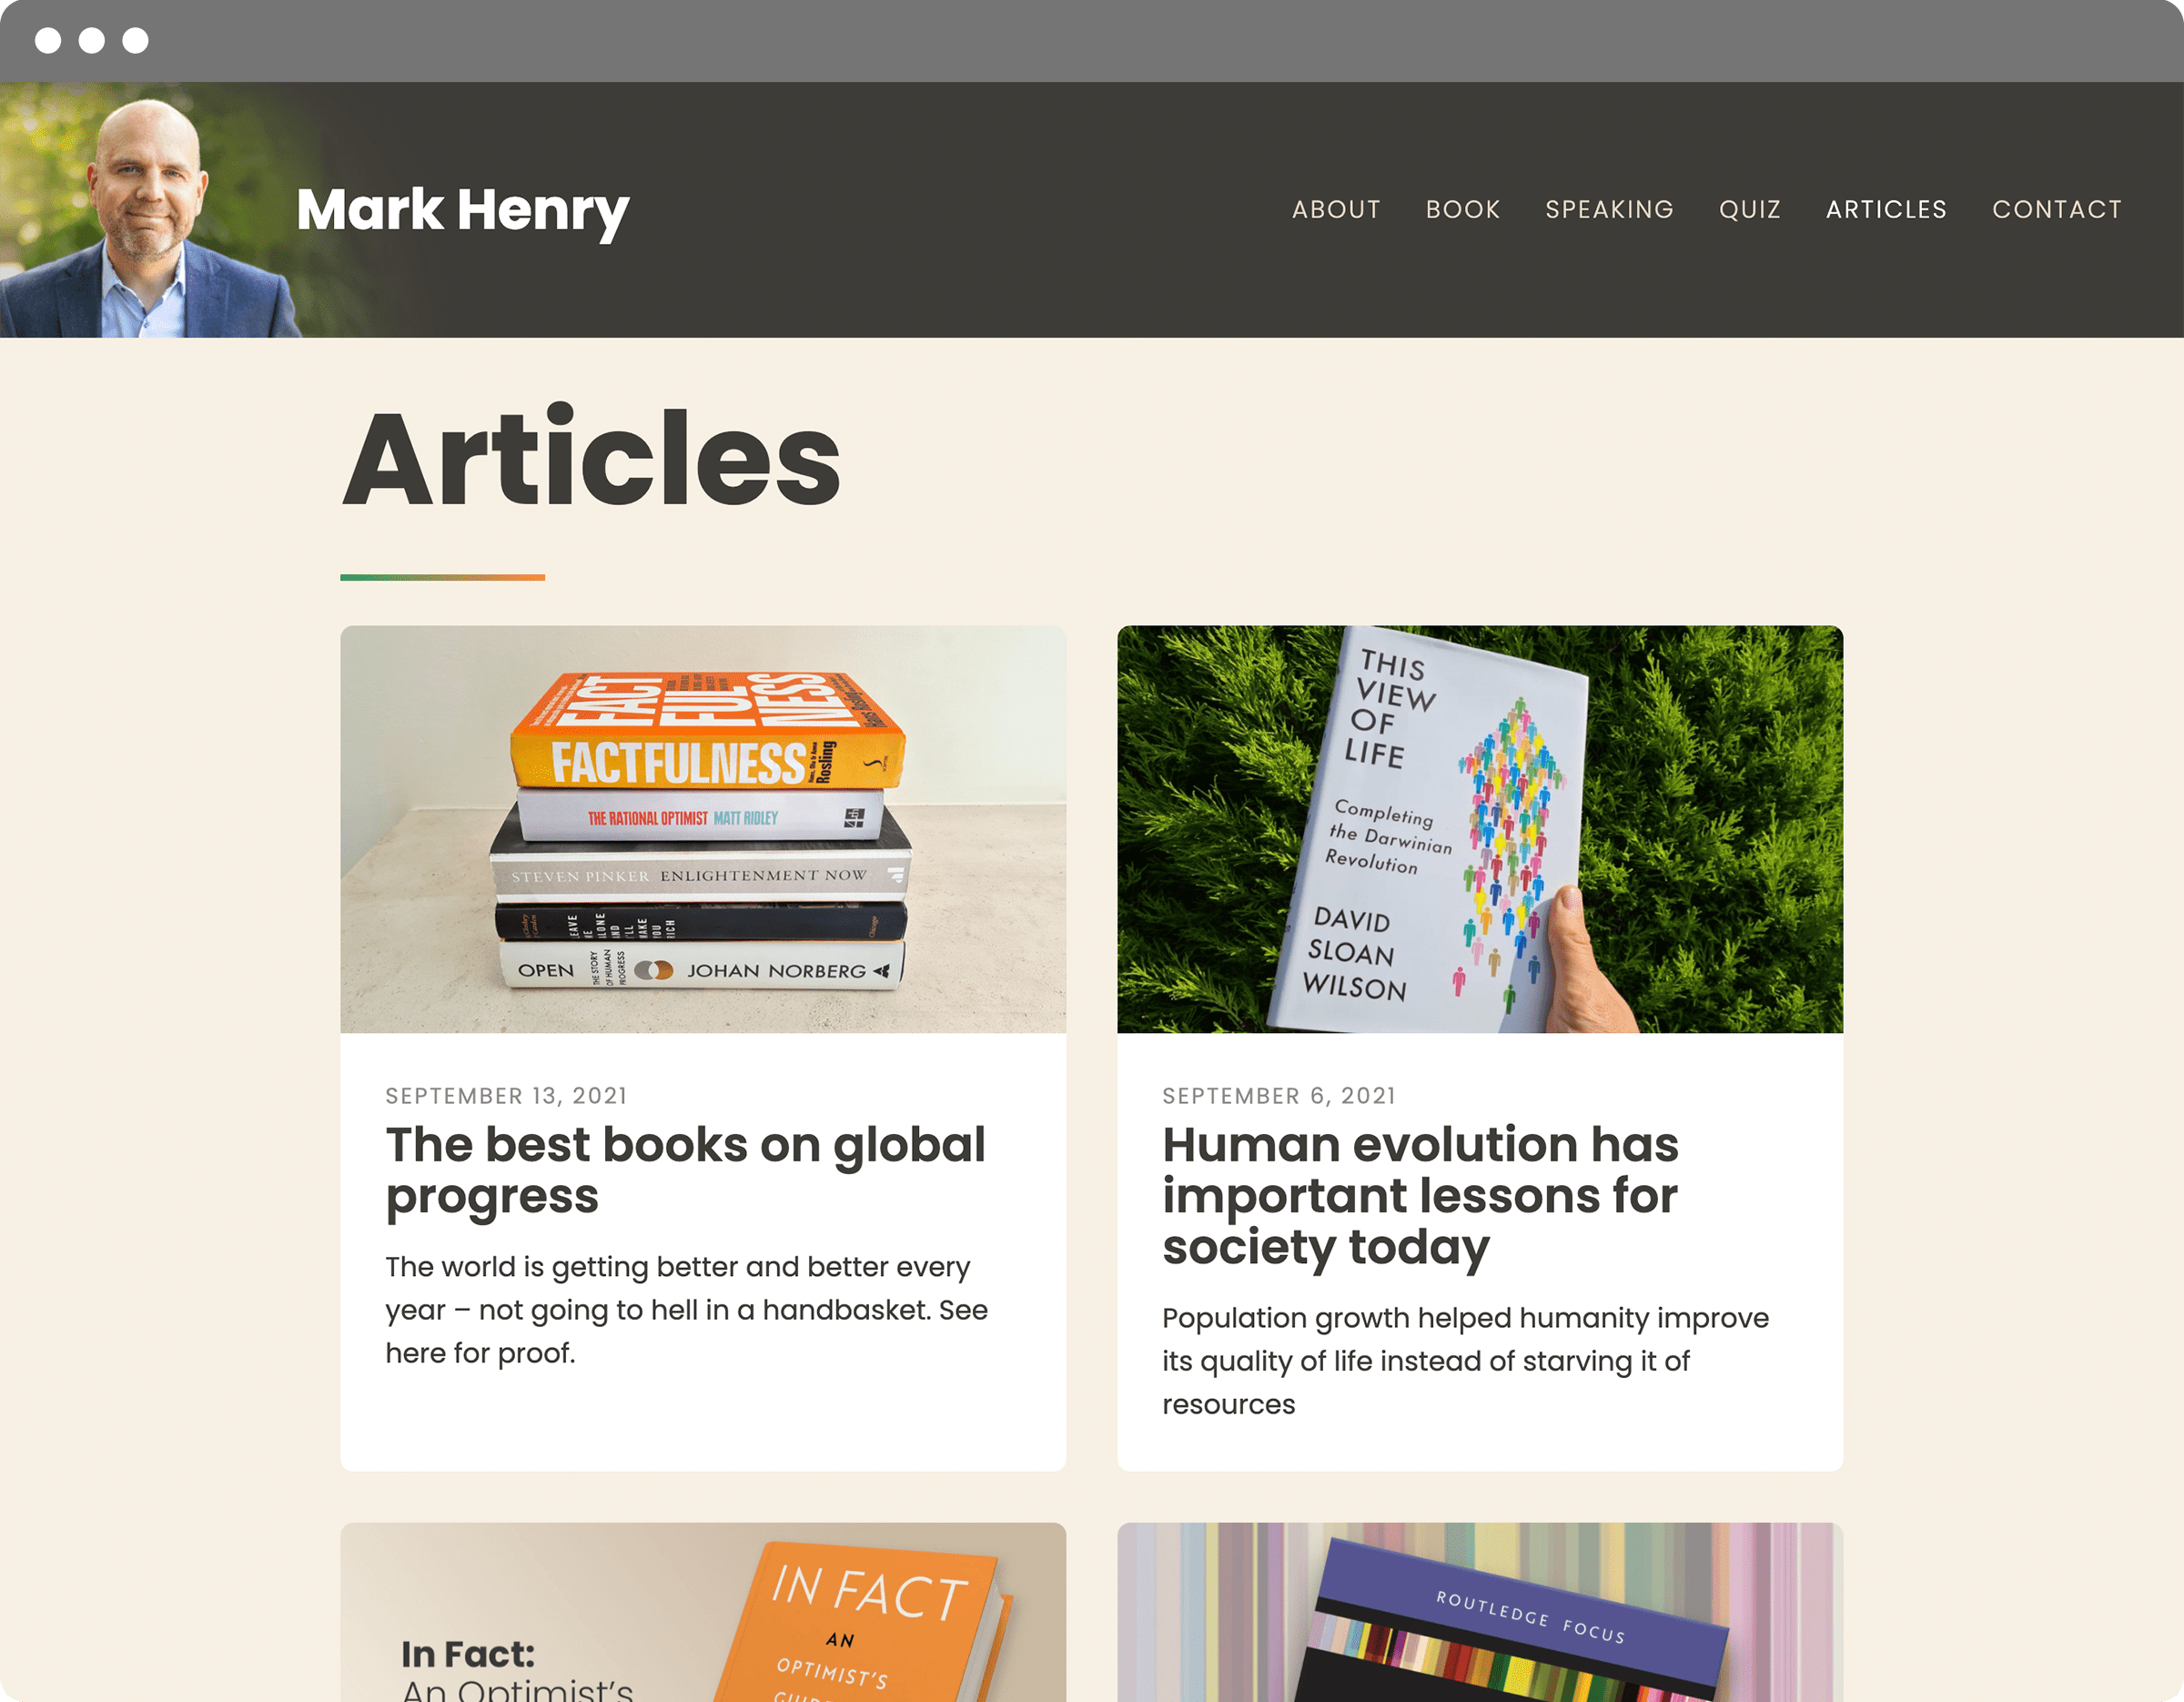 Mark Henry website articles index